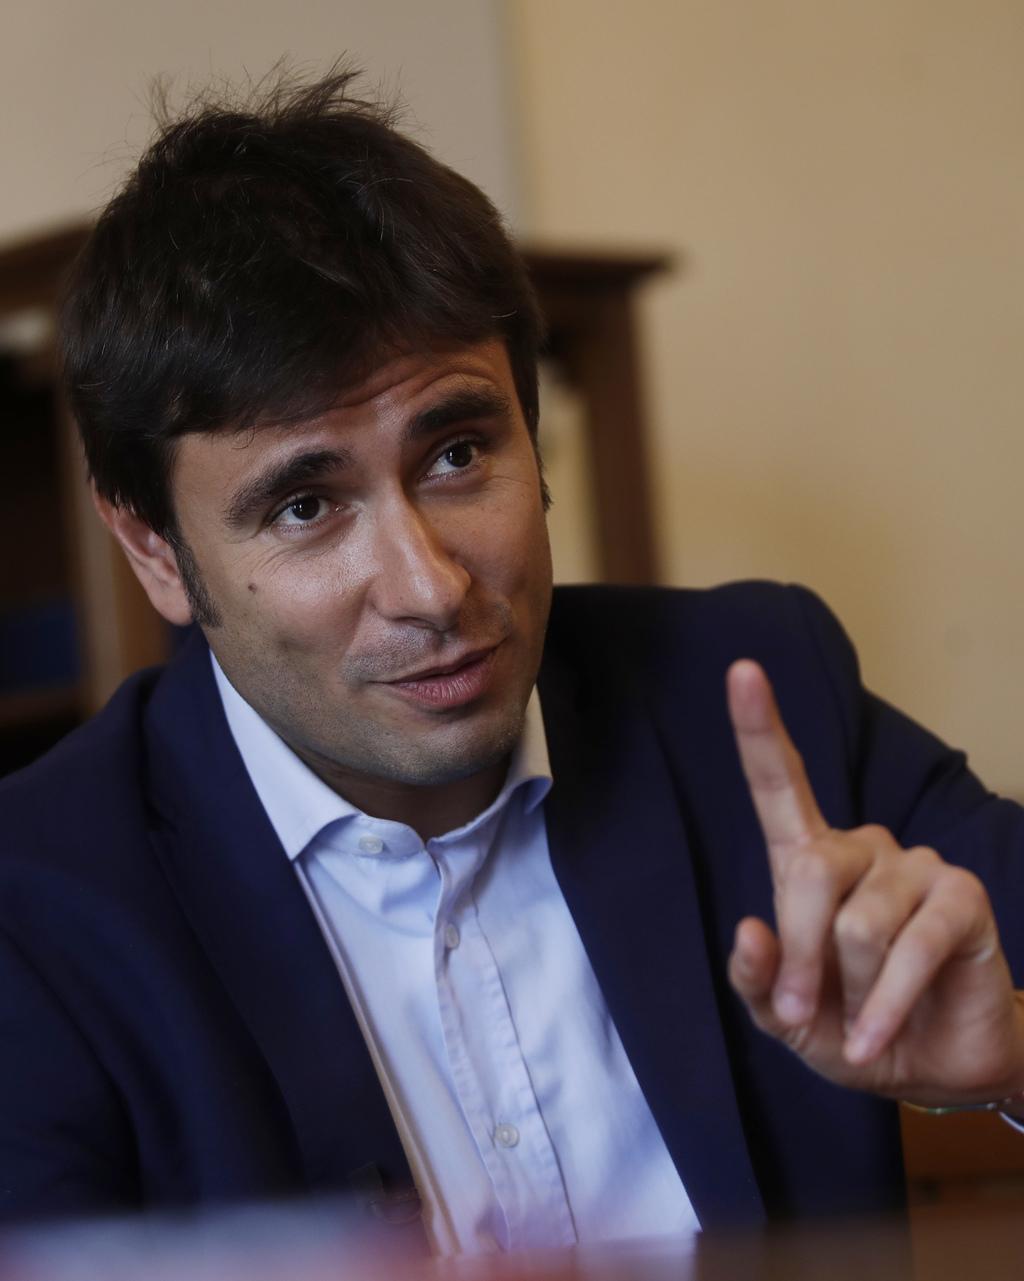 s anti establishment stars pull ahead of democrats s 5 star movement lawmaker alessandro di battista answers questions during an interview the associated press in rome tuesd